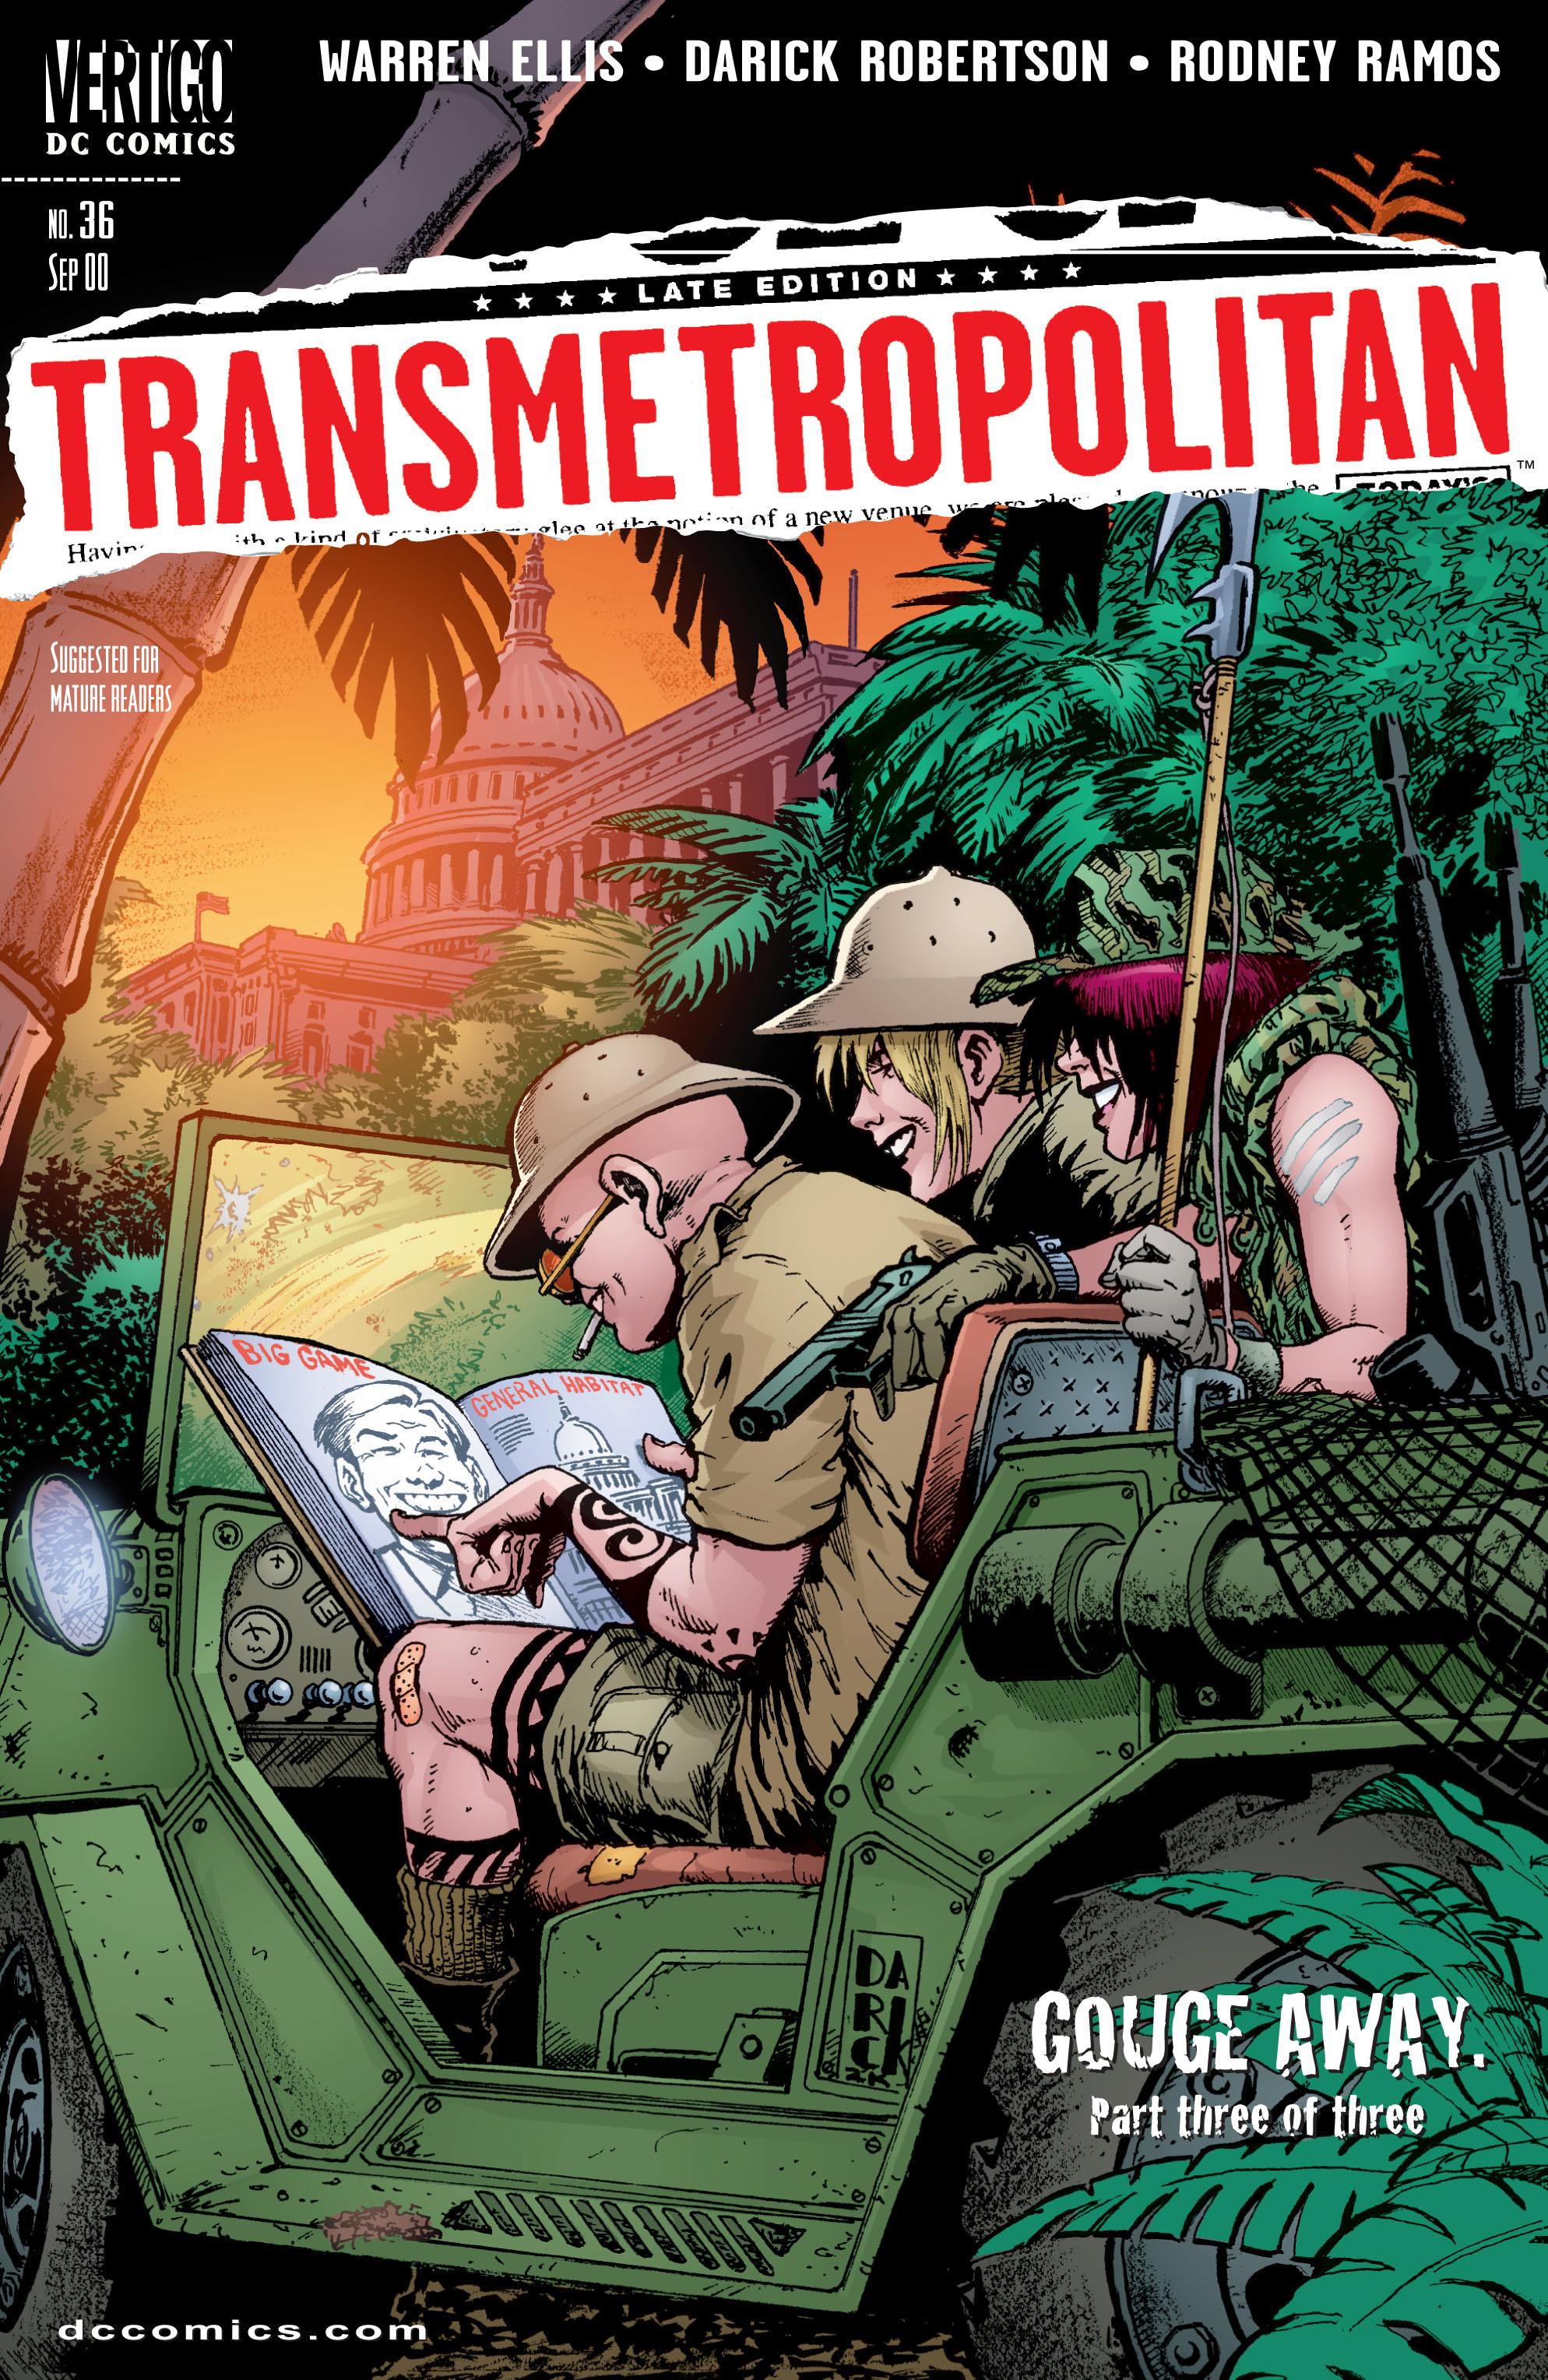 Read online Transmetropolitan comic -  Issue #36 - 1